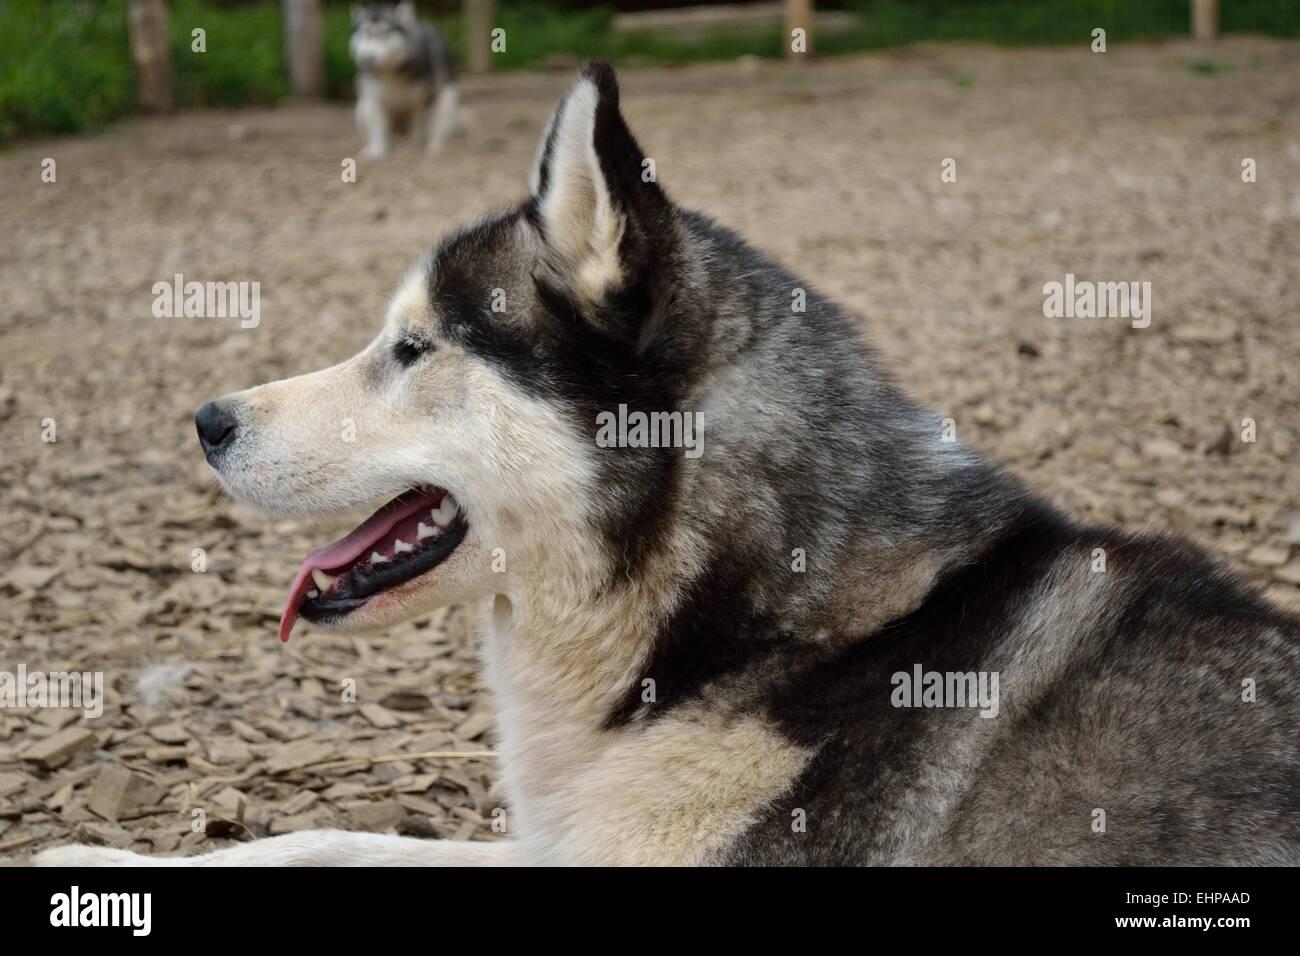 Husky panting - Stock Image